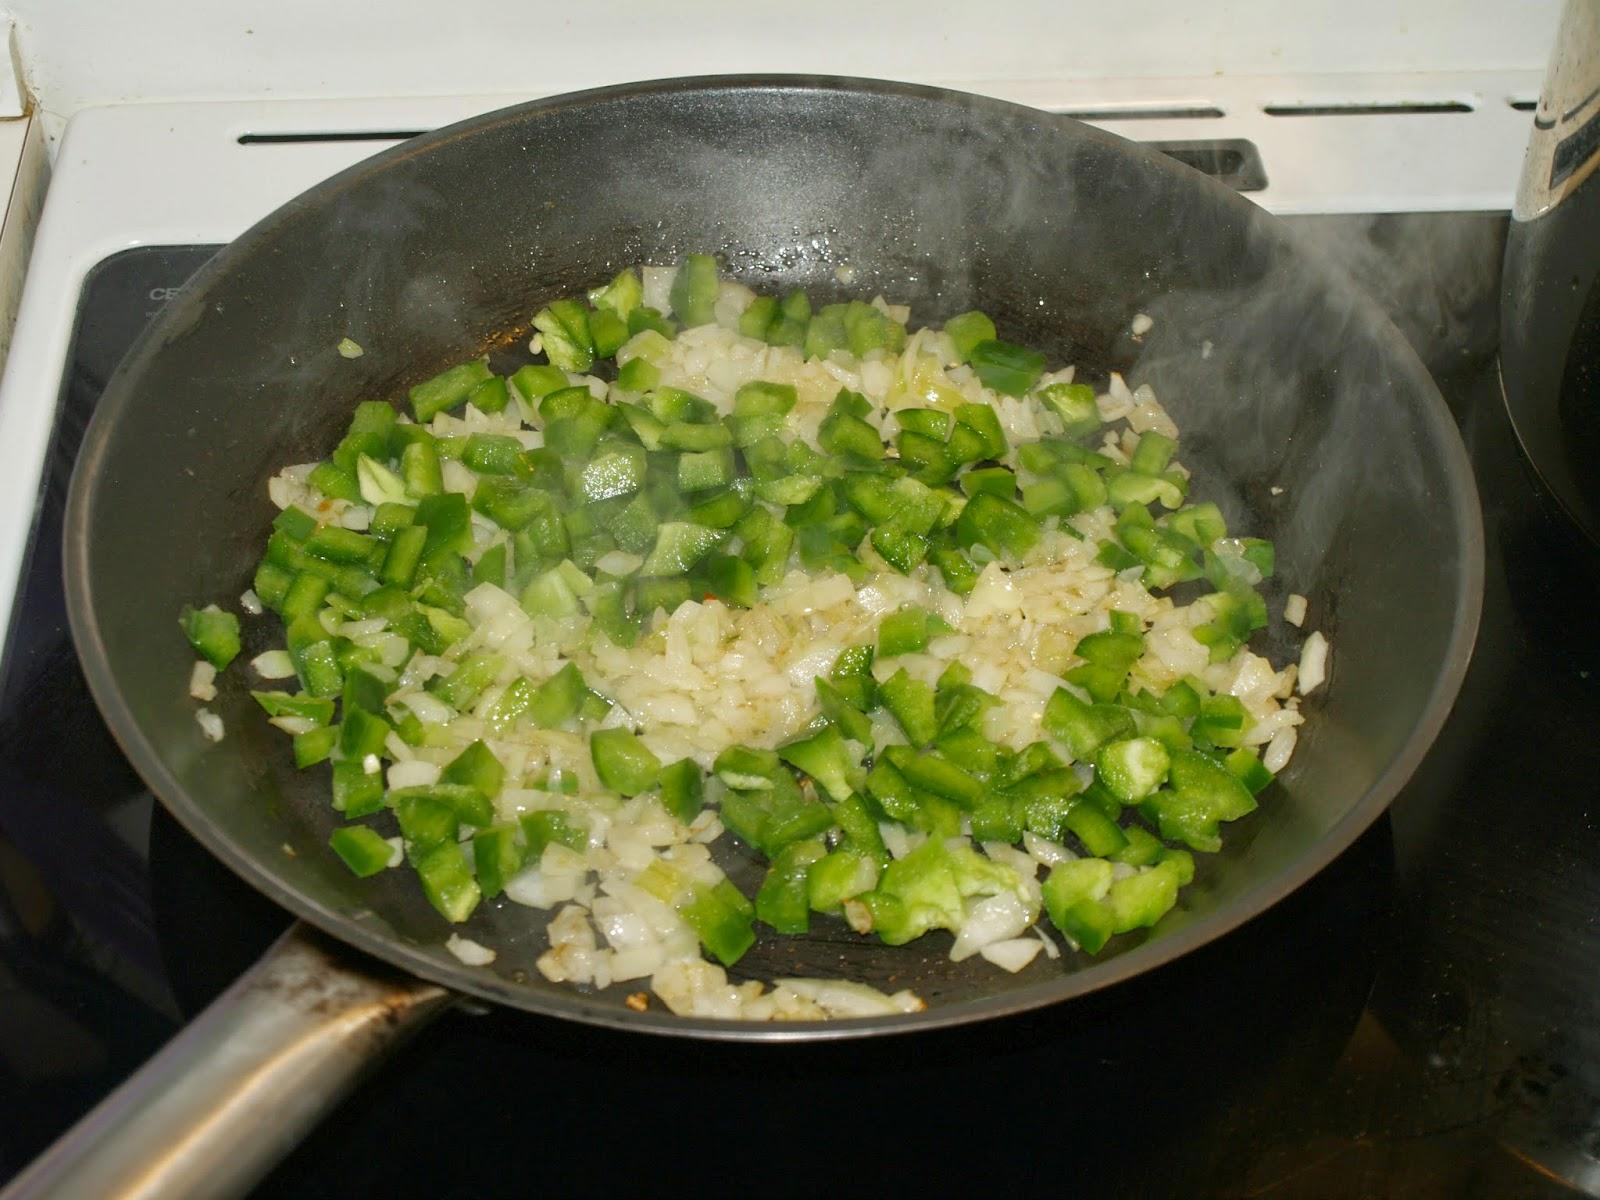 Mins cocina menemen huevos revueltos turcos con salsa for Cocinar huevos 7 days to die